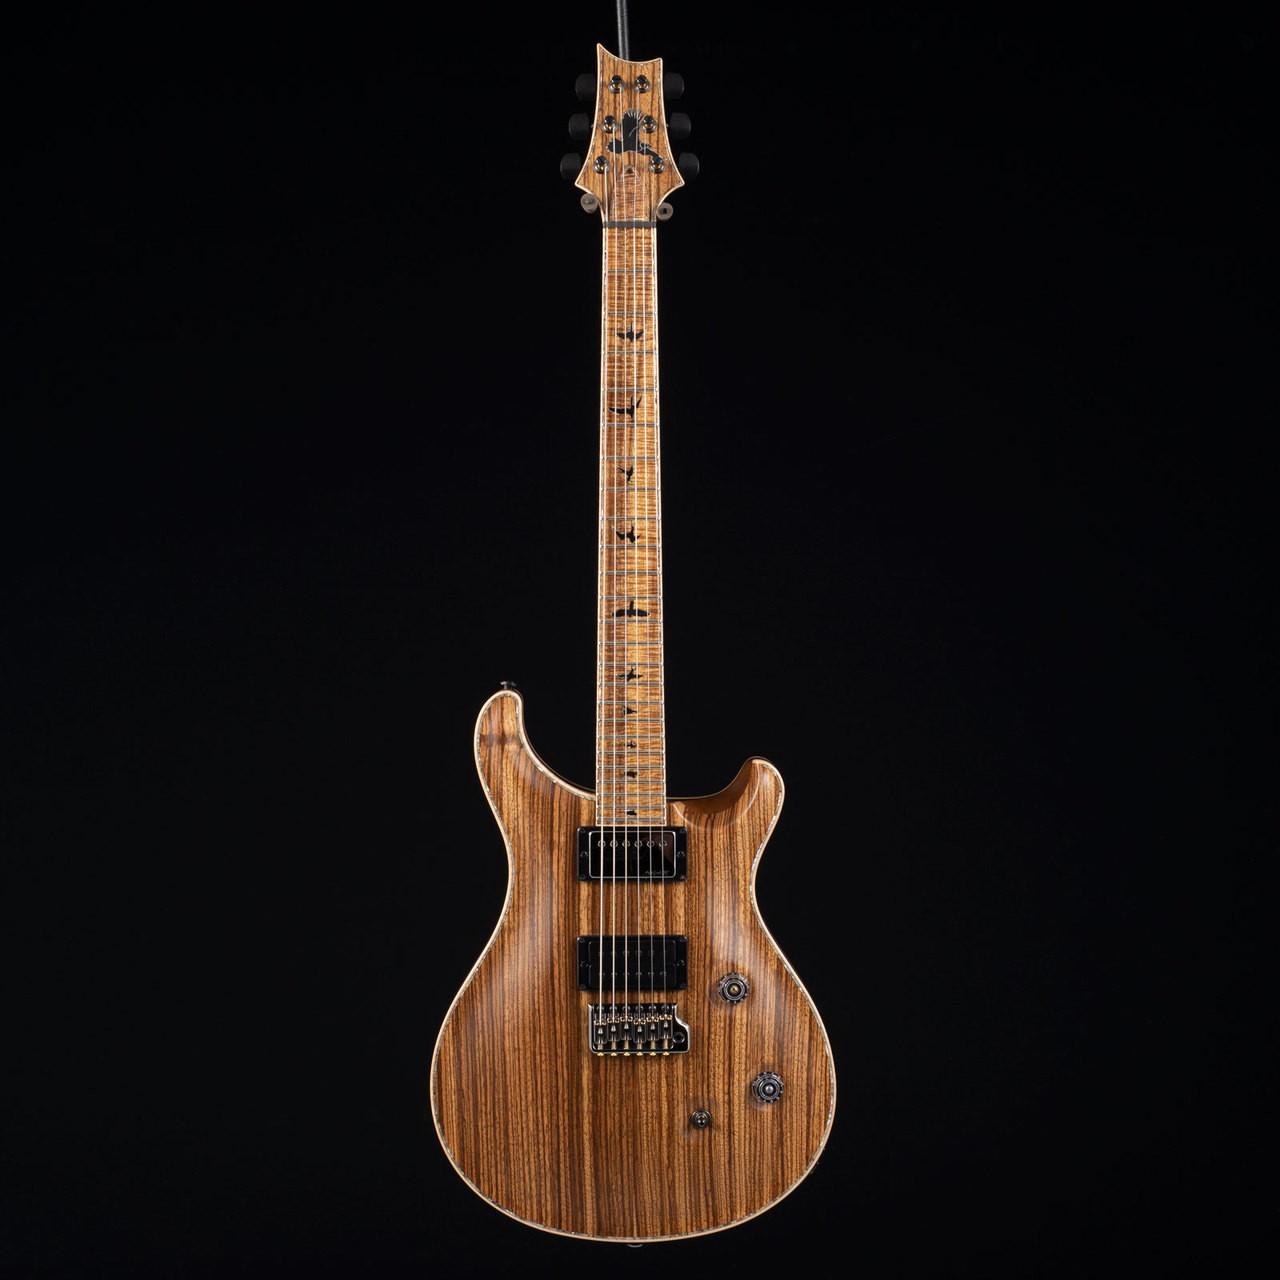 30555629a47 PRS Private Stock Custom 24 Natural Zebrawood 6512 at Moore Guitars